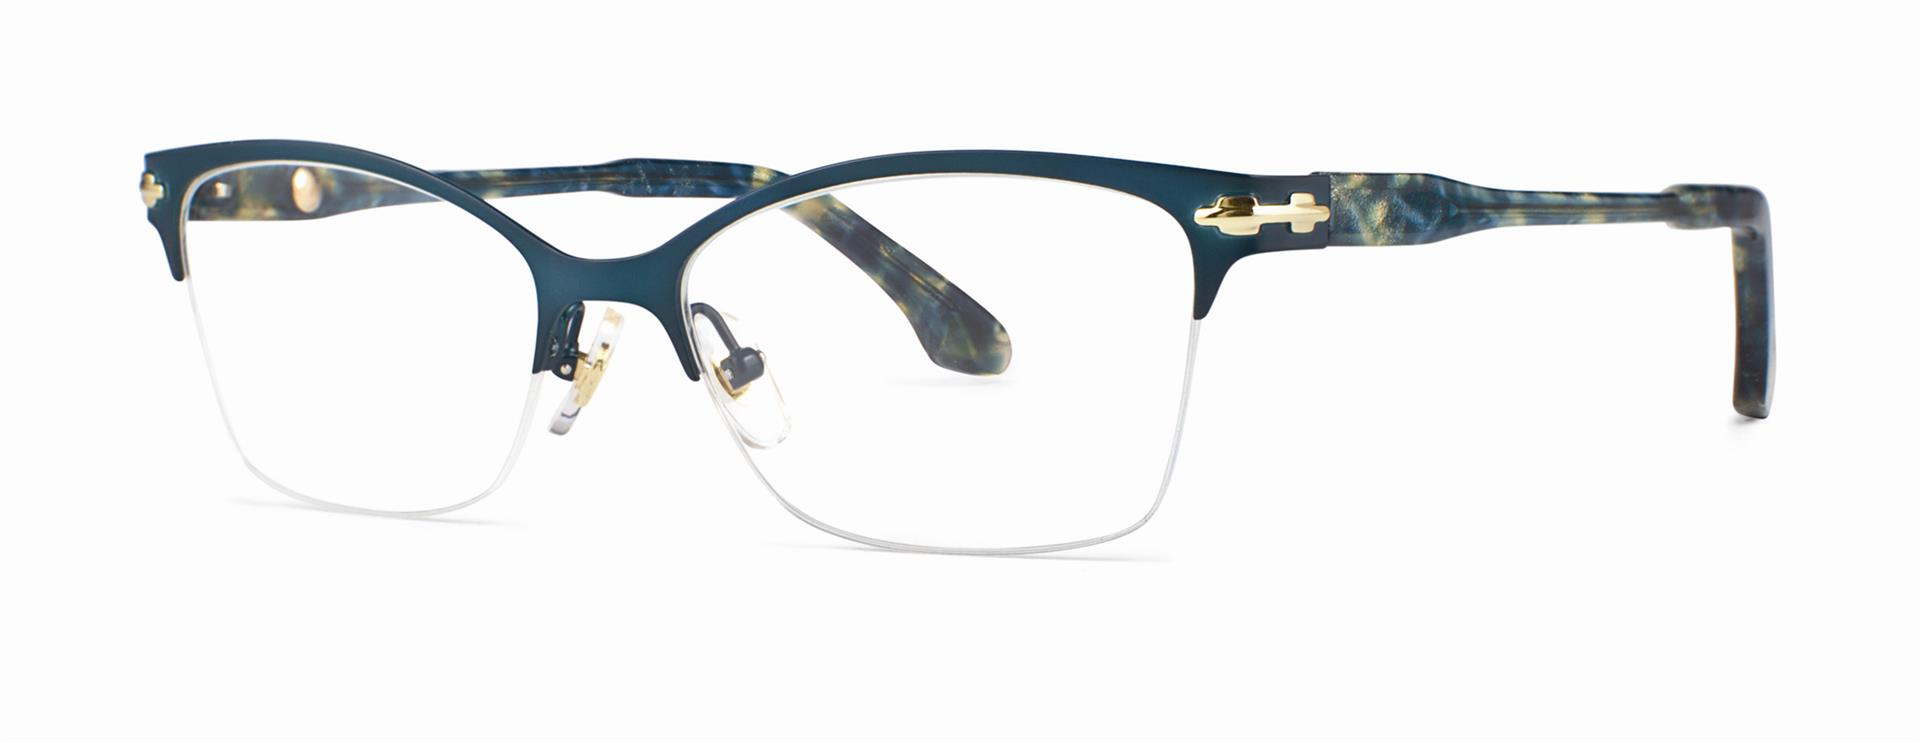 0ace320e44f Bon Vivant designs luxury eyewear